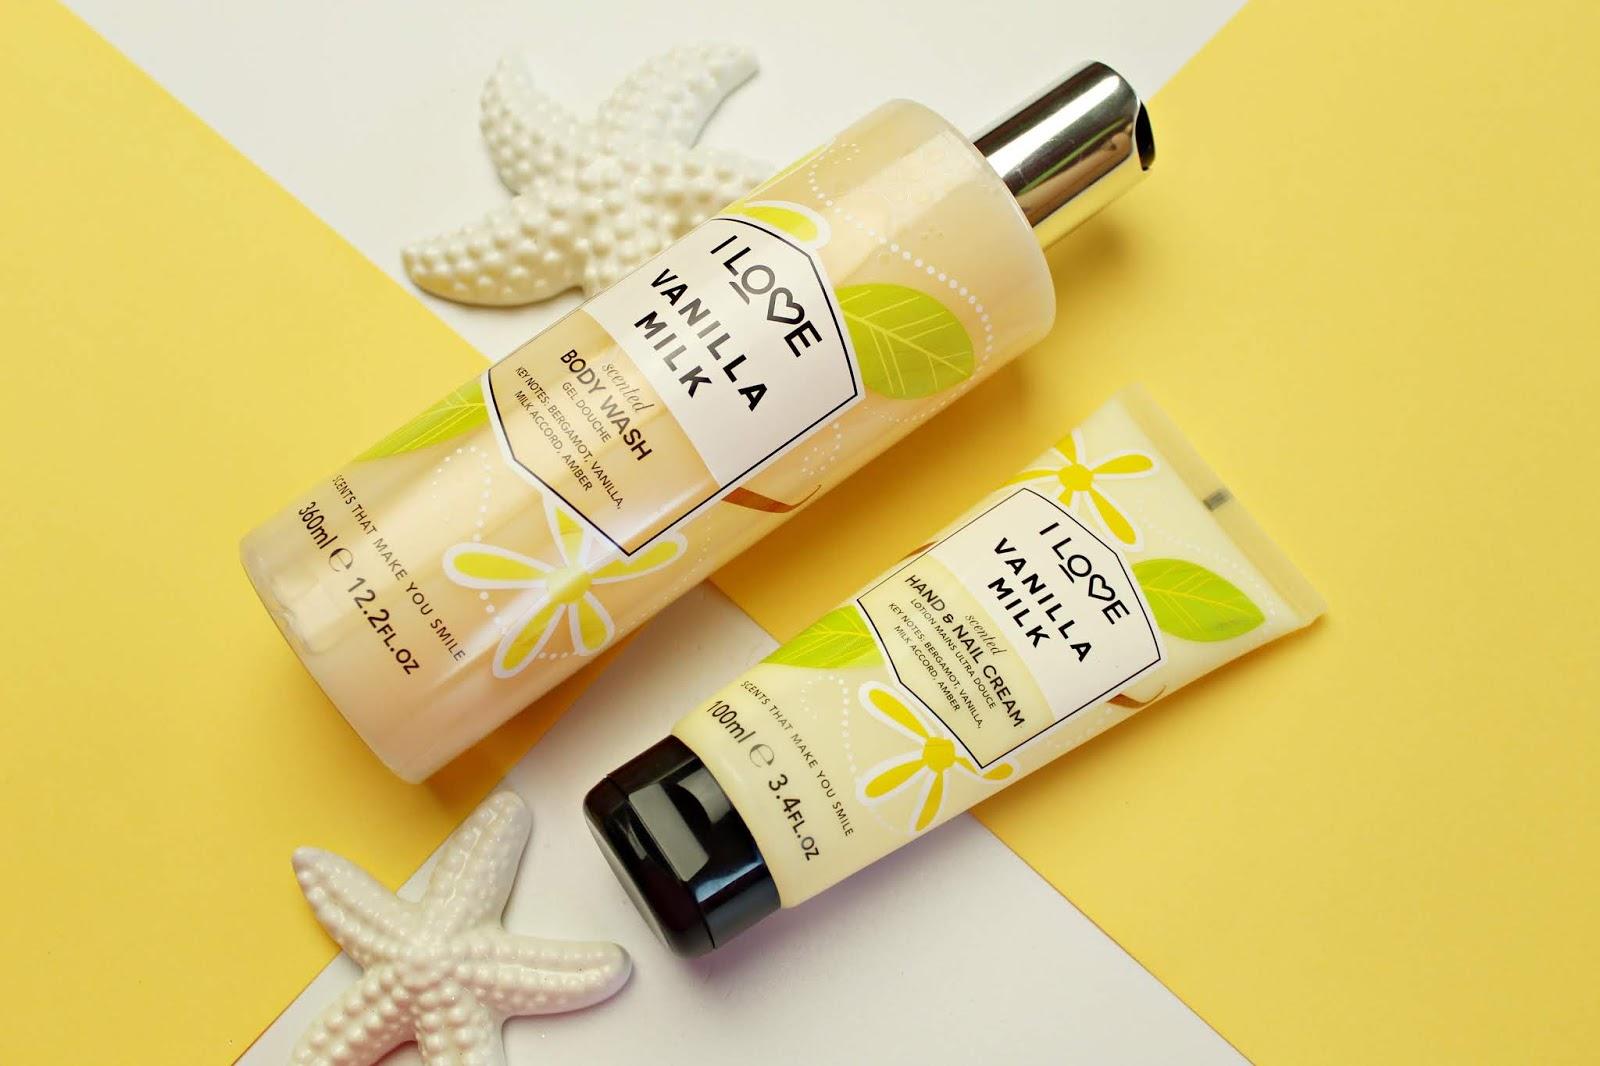 I LOVE COSMETICS - Vanilla Milk - żel pod prysznic i krem do rąk